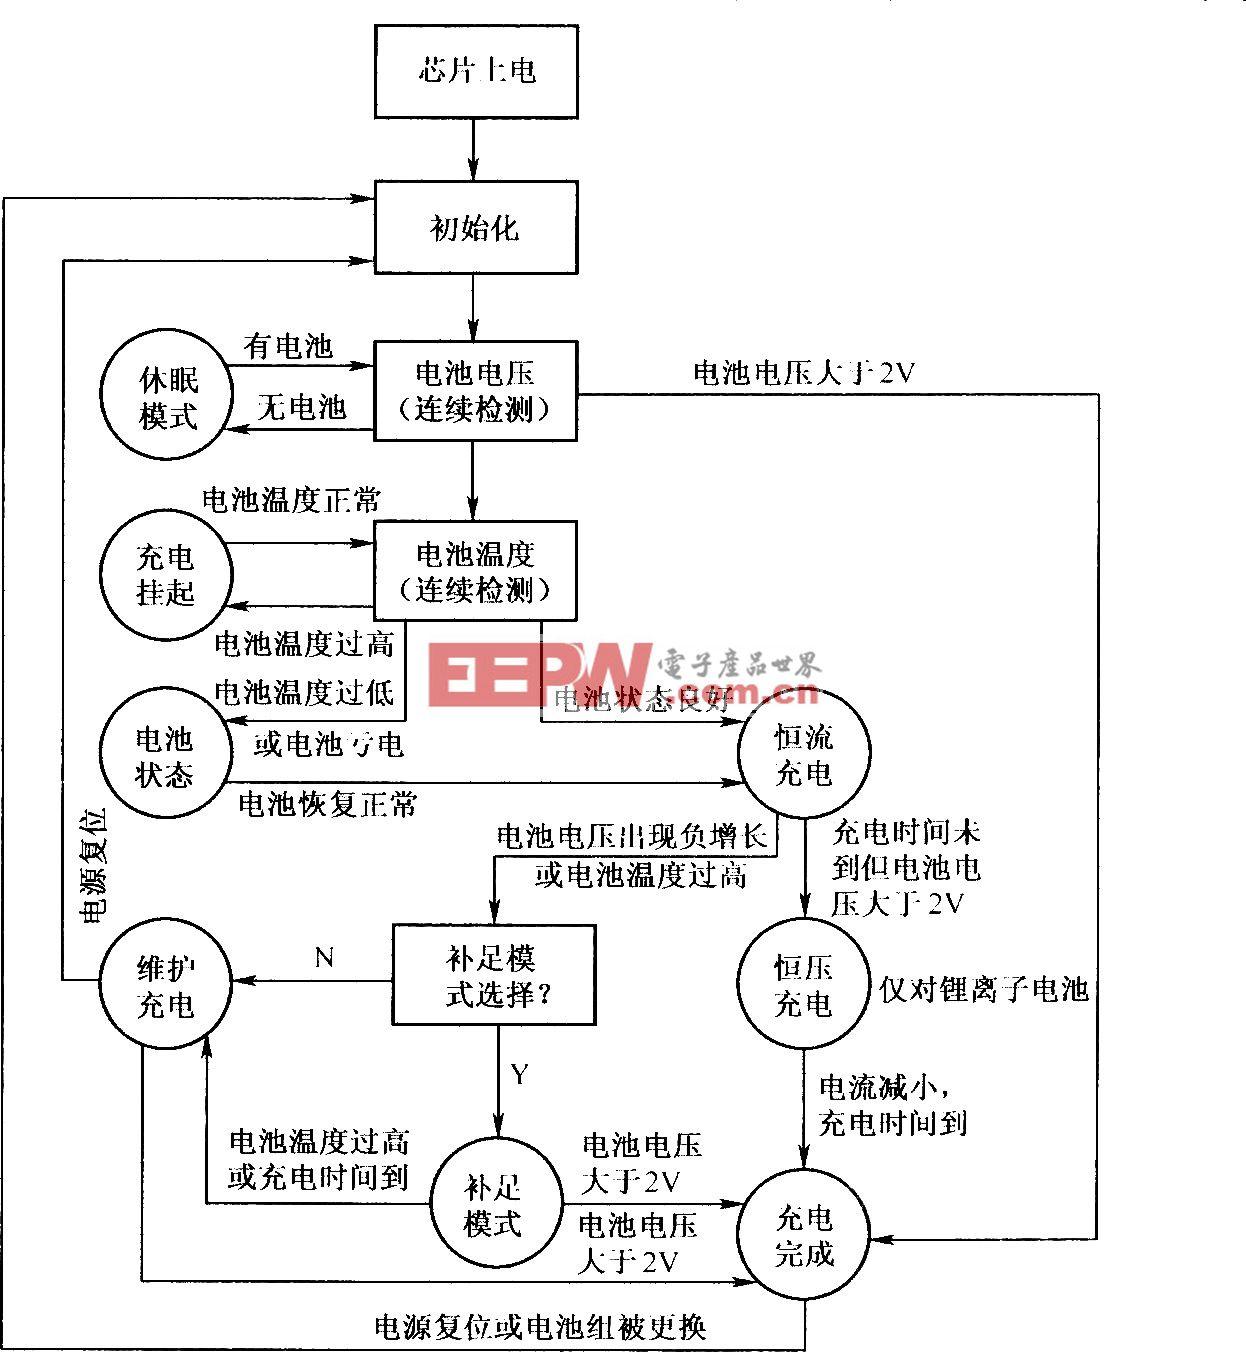 BQ2000充电管理流程图